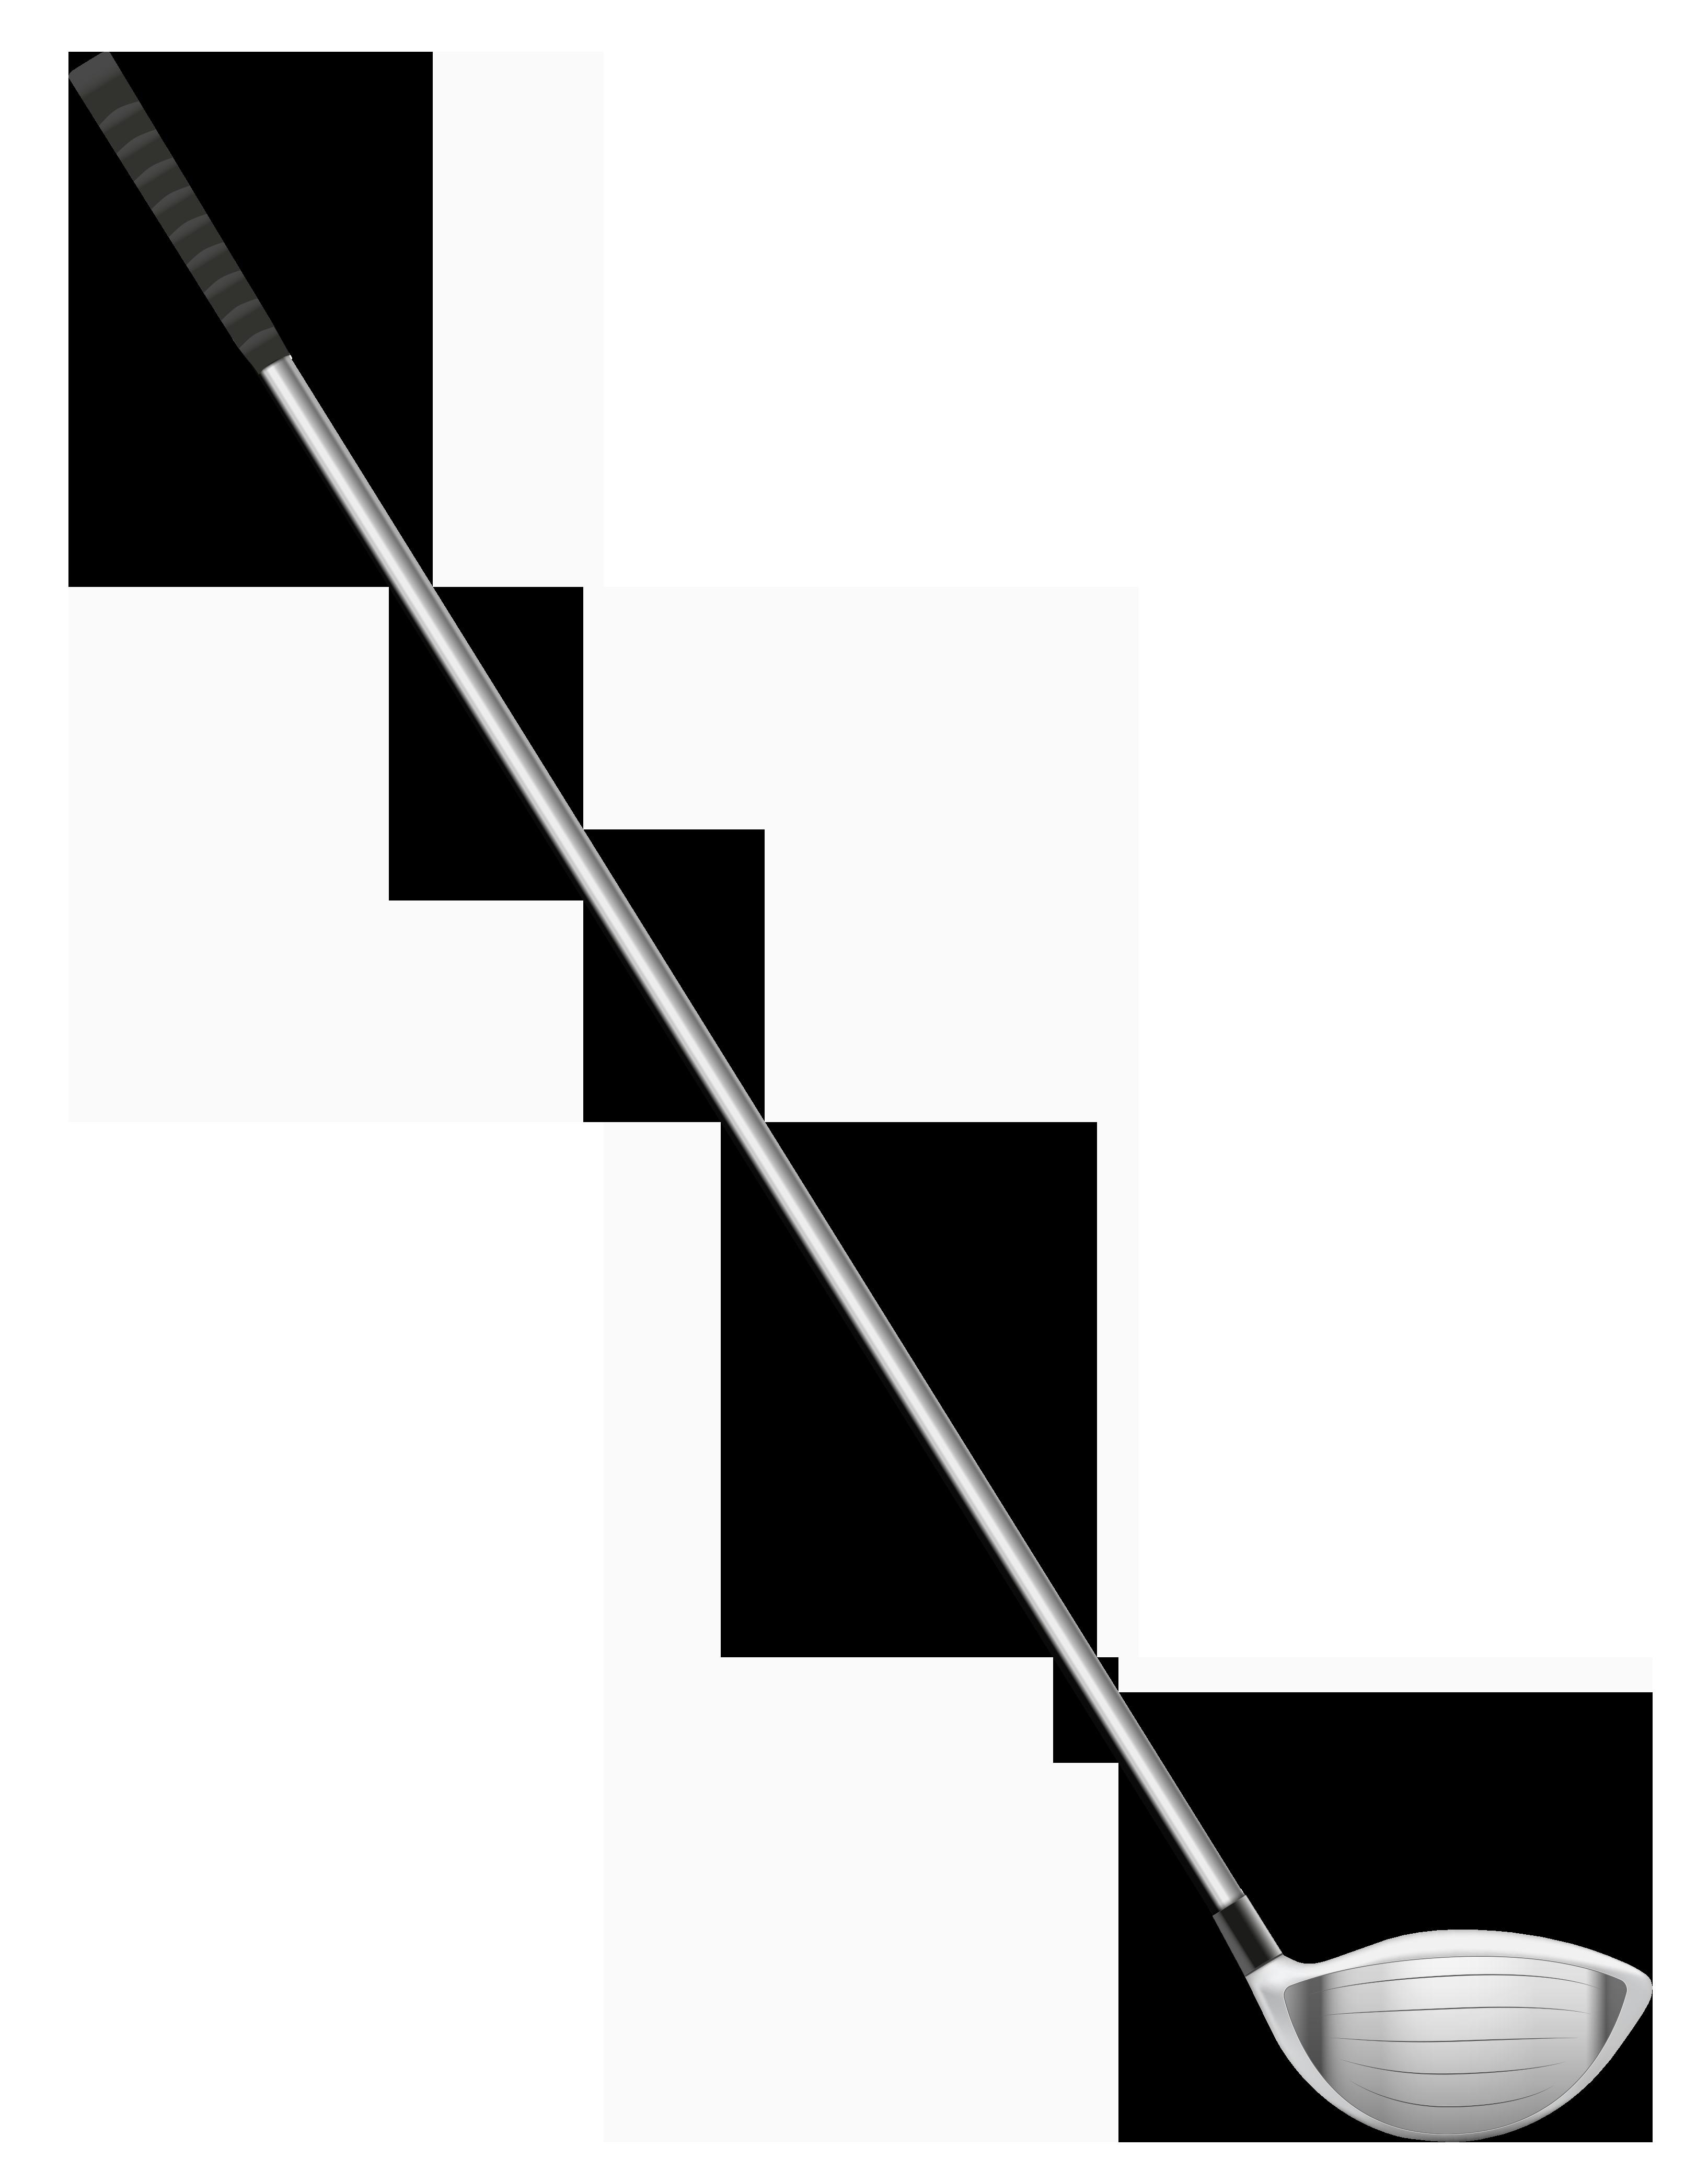 Golf Course clipart border Clipartix club clubs stick art